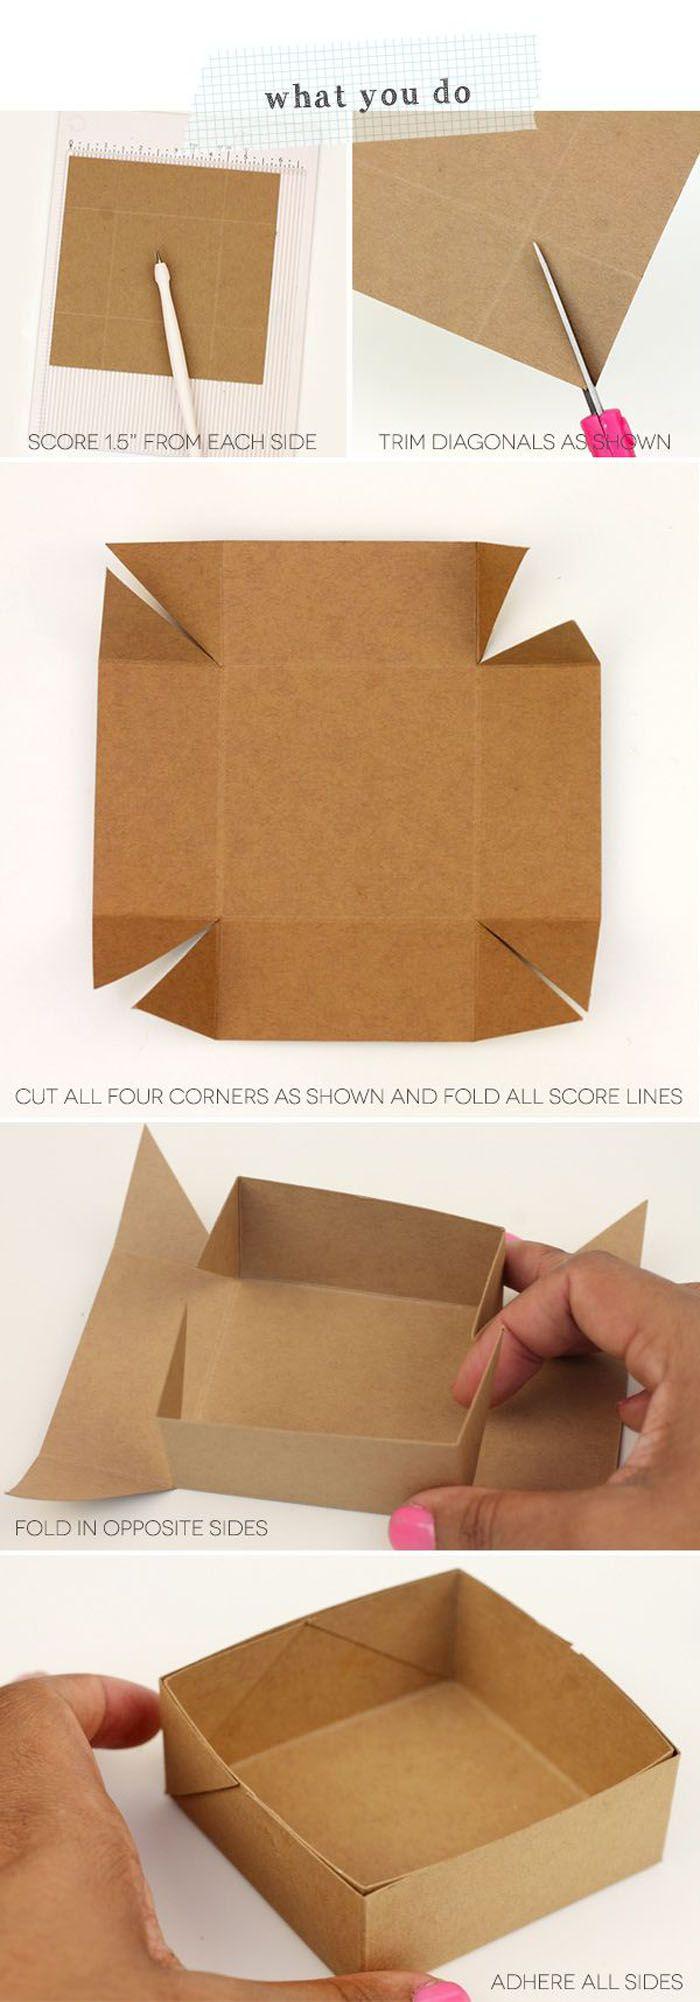 geschnkbox basteln geschnkideen diy deko upcycling ideen tasse selber gestalten einfache schachtel